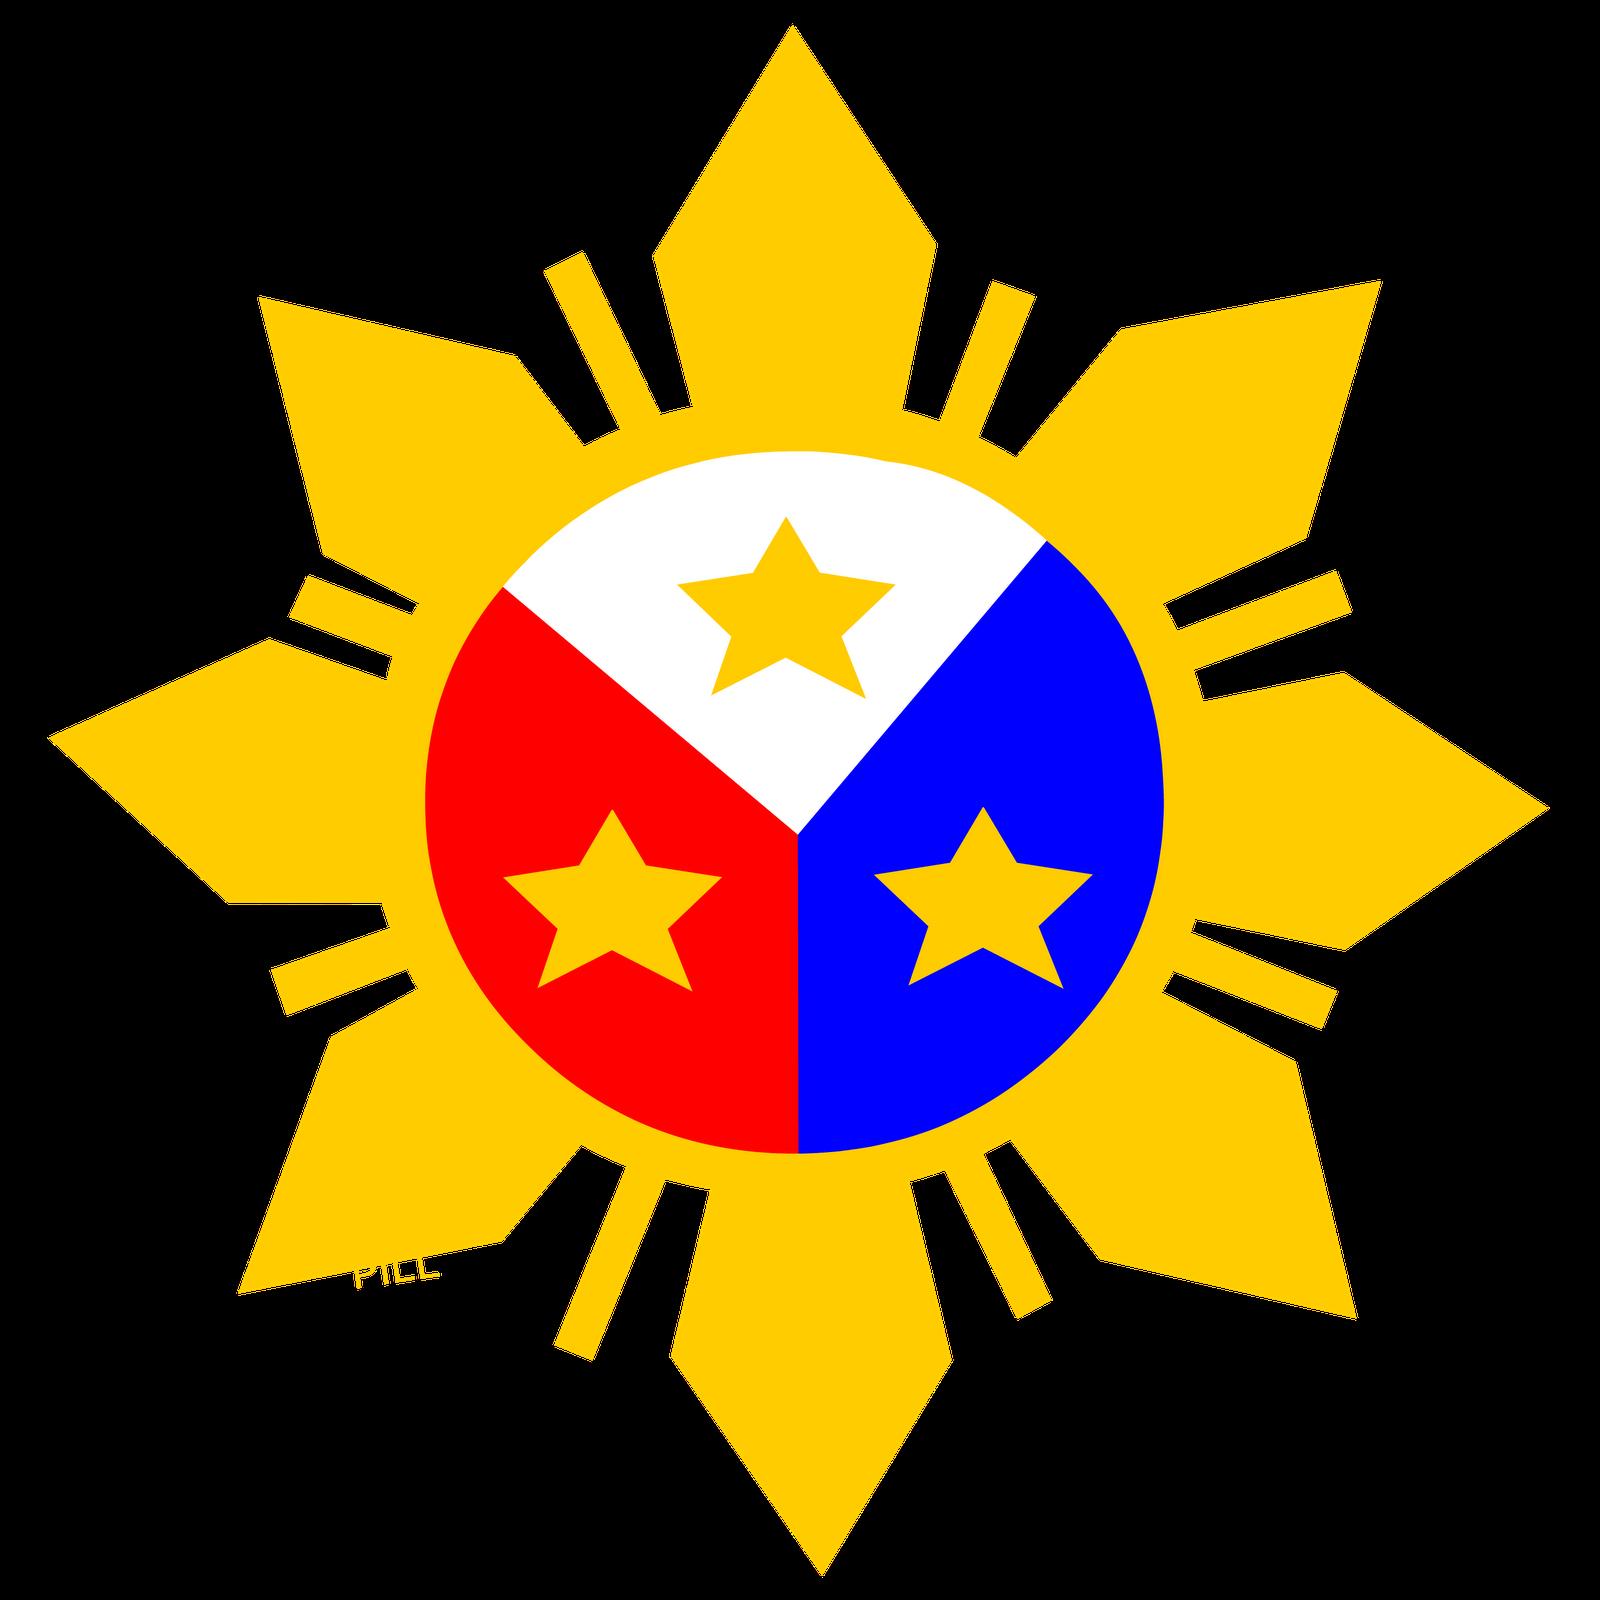 Flag of the philippines. Mango clipart philippine symbol